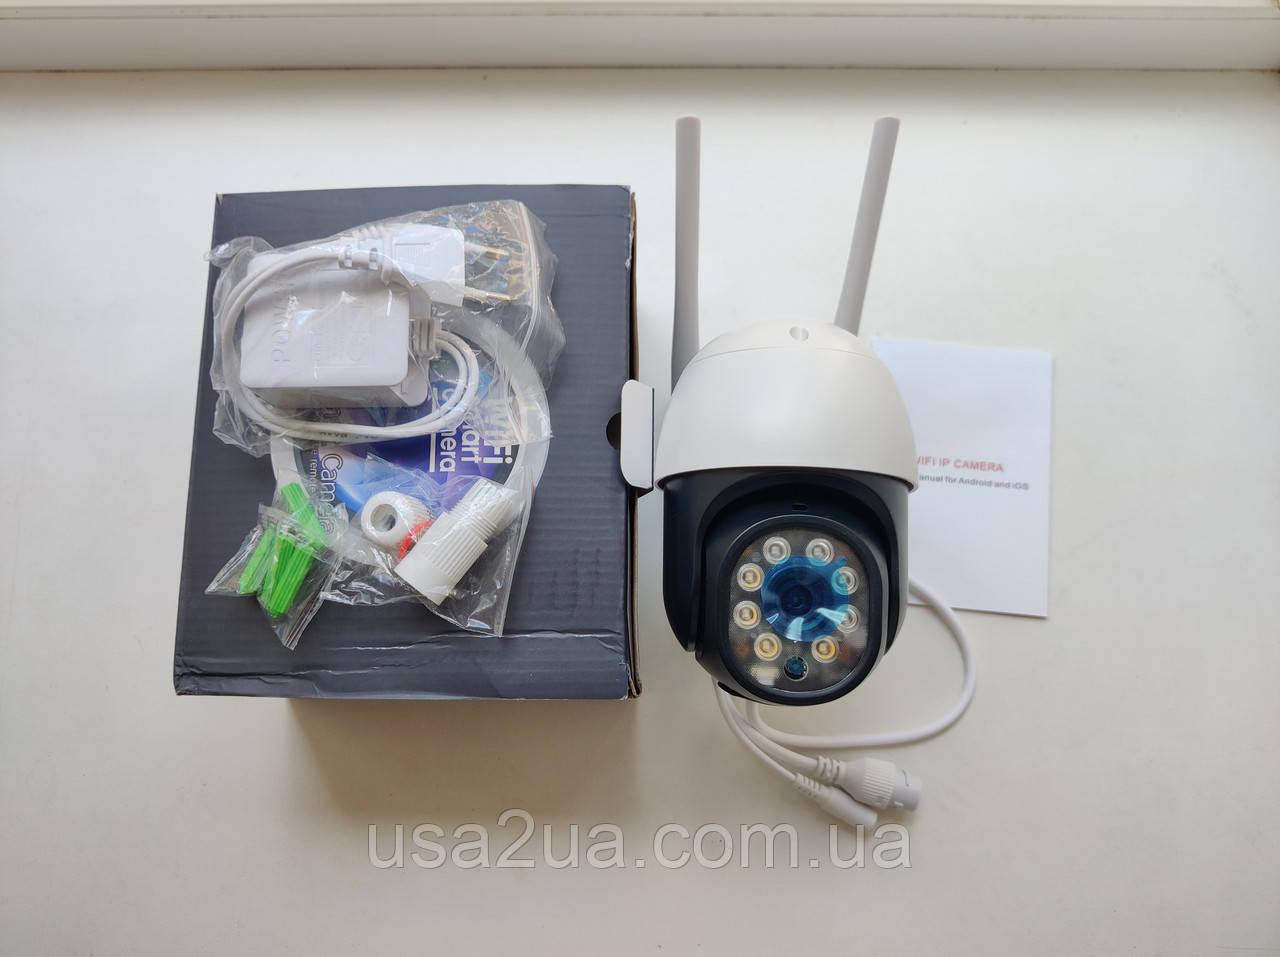 Беспроводная поворотная 3 Мп уличная IP WiFi камера Besder BES-A8-3MP 1536P Onvif. iCSee гарантия кредит